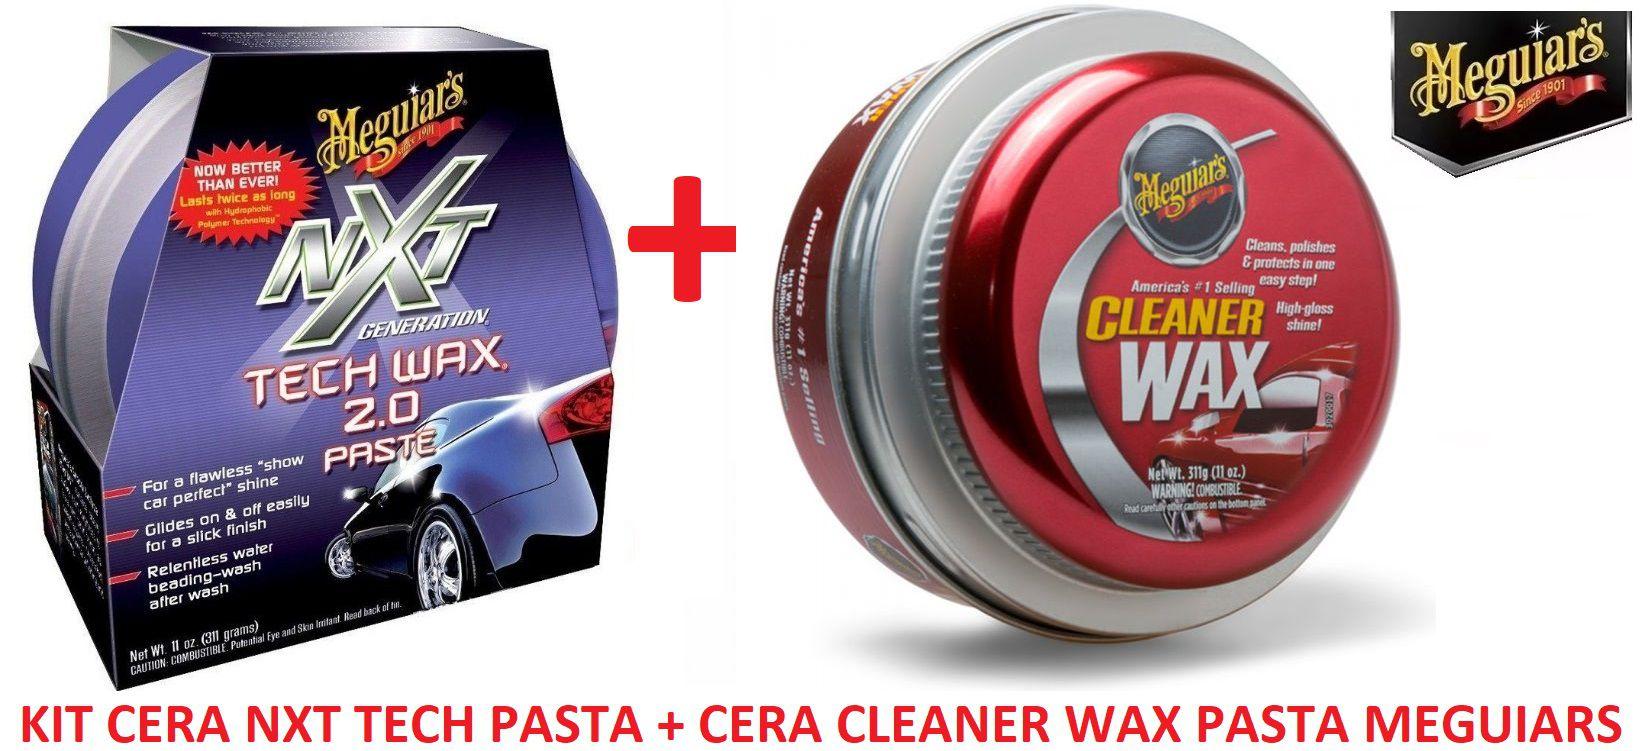 Kit Cera Nxt Tech Wax 2.0 Meguiars Pasta Roxa G12711 + 01 Cera Meguiars Cleaner Wax Pasta Limpadora A1214 (ref:A1214)